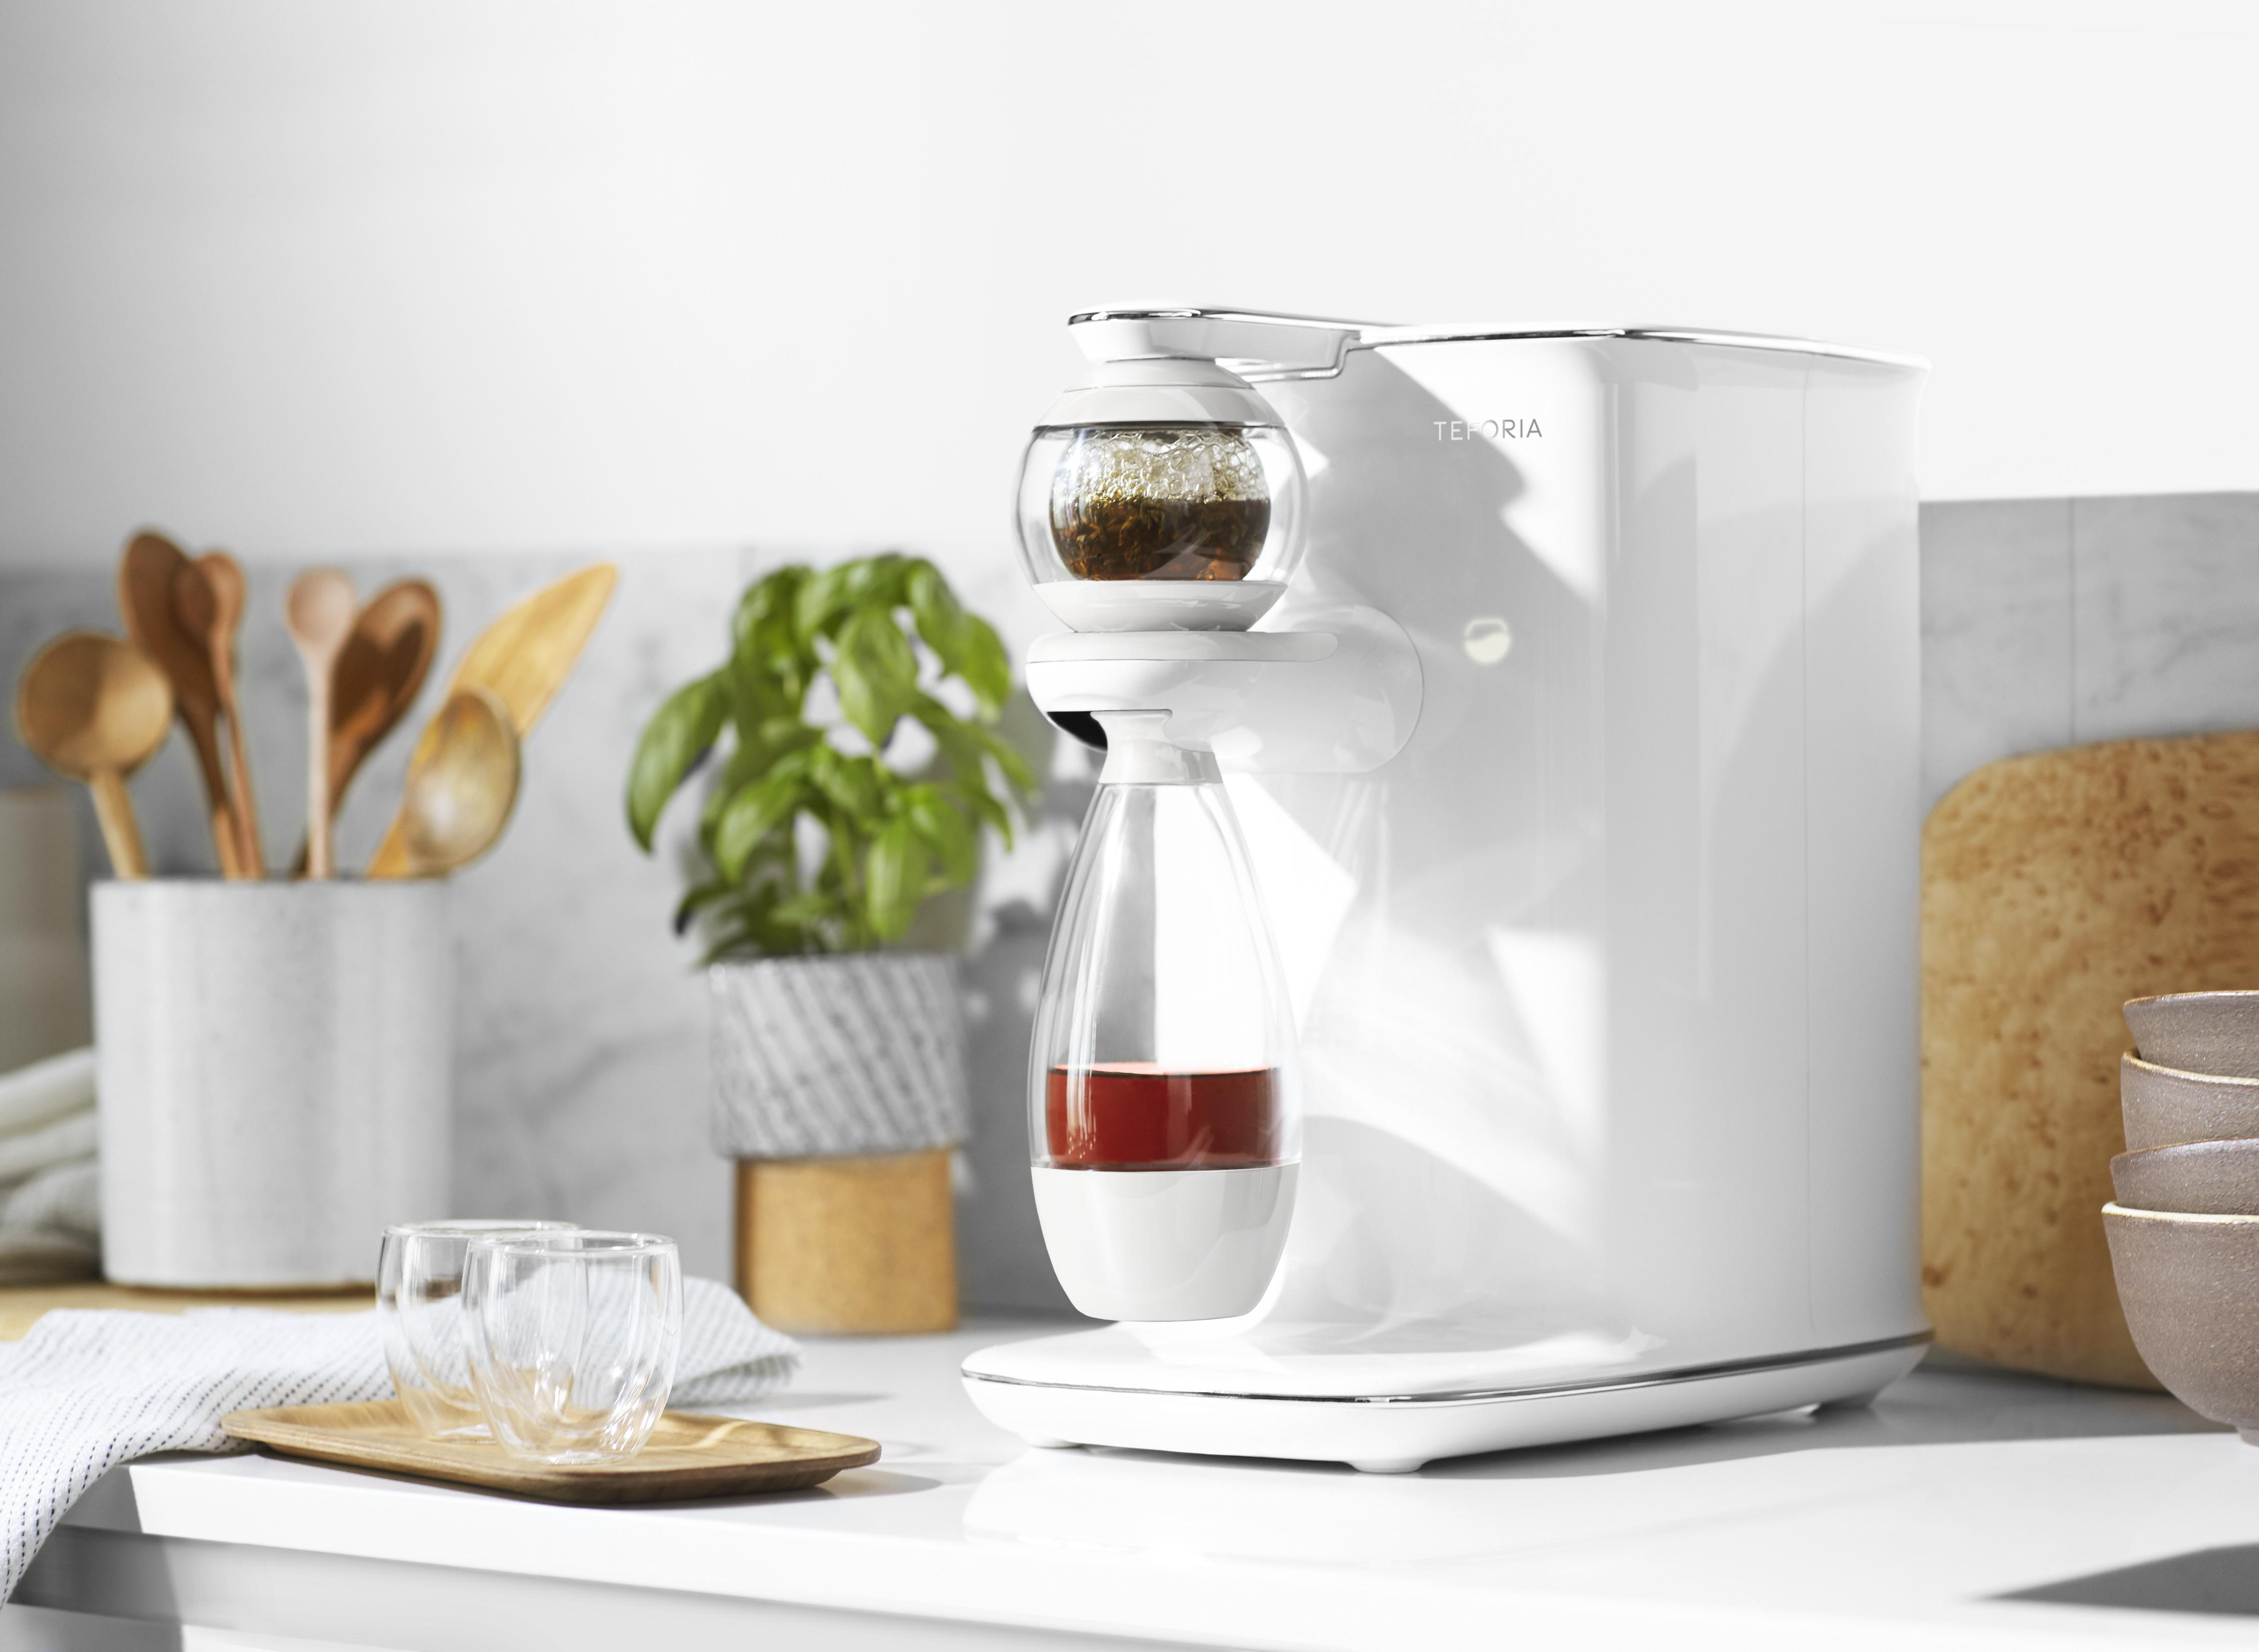 $1,000 tea infuser startup Teforia shuts down